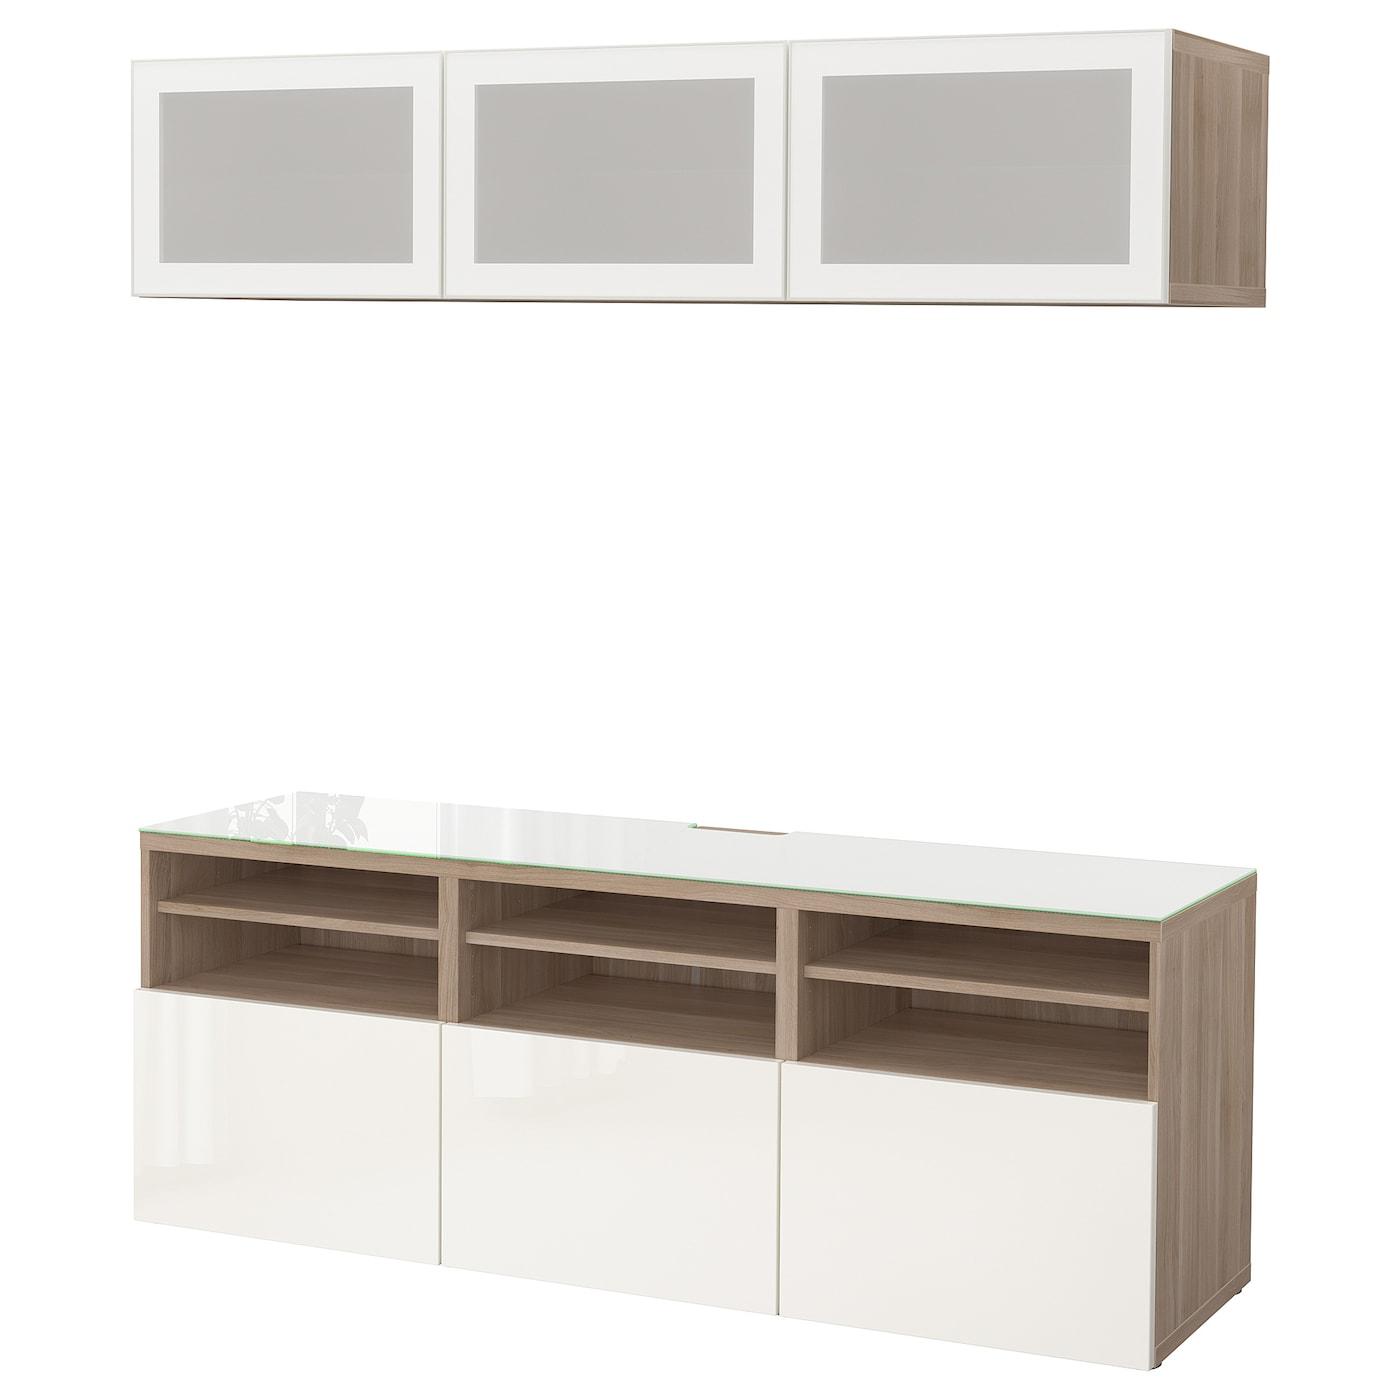 Best mueble tv con almacenaje efecto nogal tinte gris selsviken alto brillo vidrioesmerilbl 180 - Muebles almacenaje ikea ...